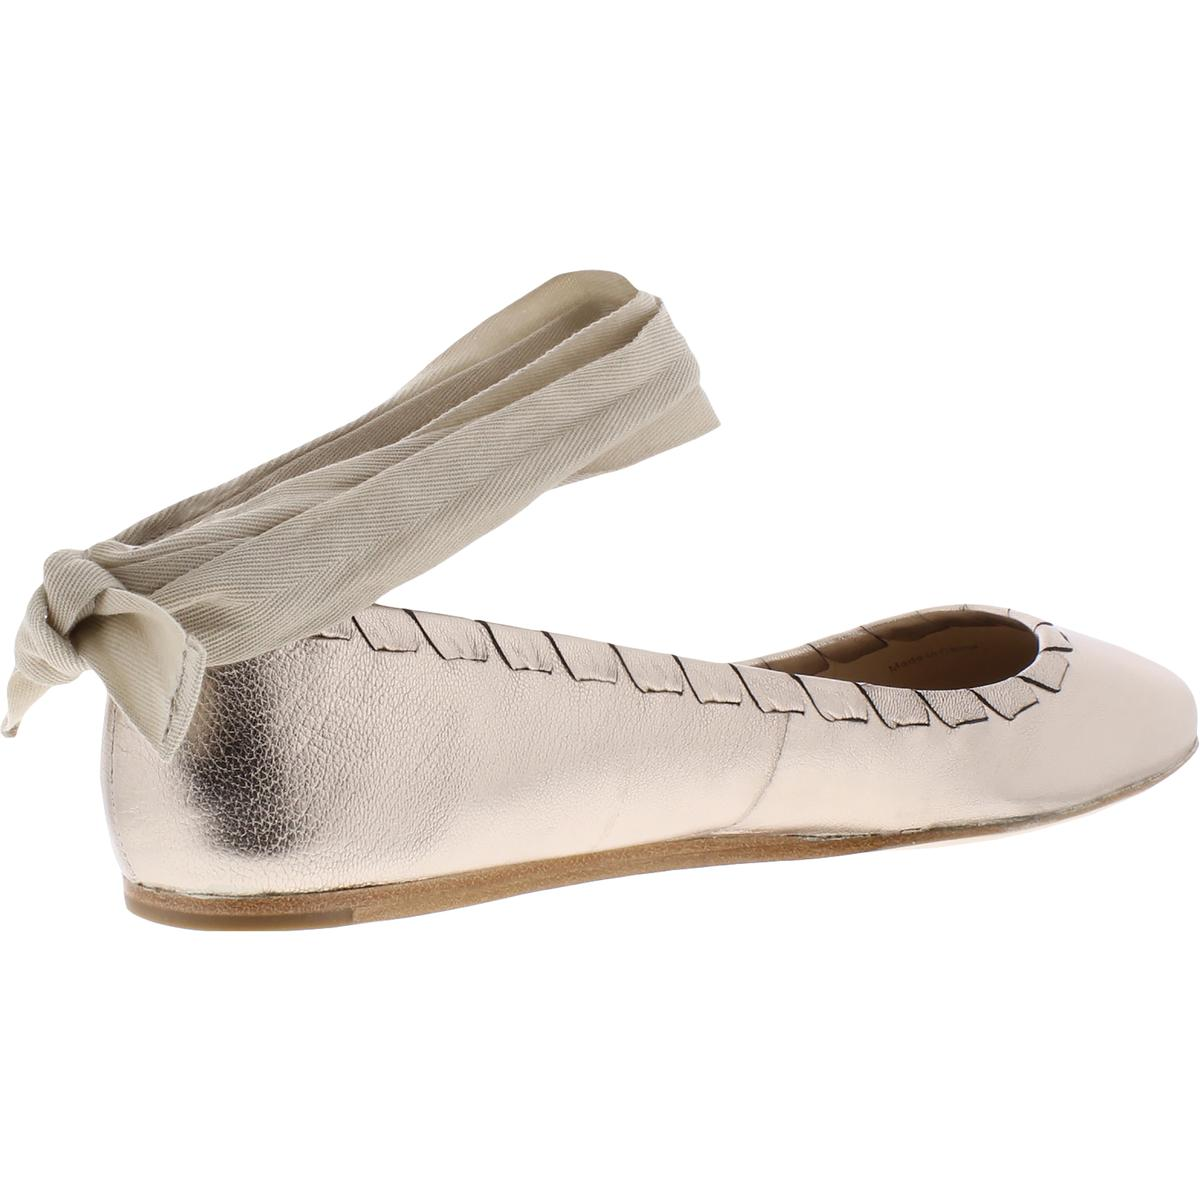 Via-Spiga-Womens-Baylie-Leather-Round-Toe-Ballet-Flats-Shoes-BHFO-6888 thumbnail 6